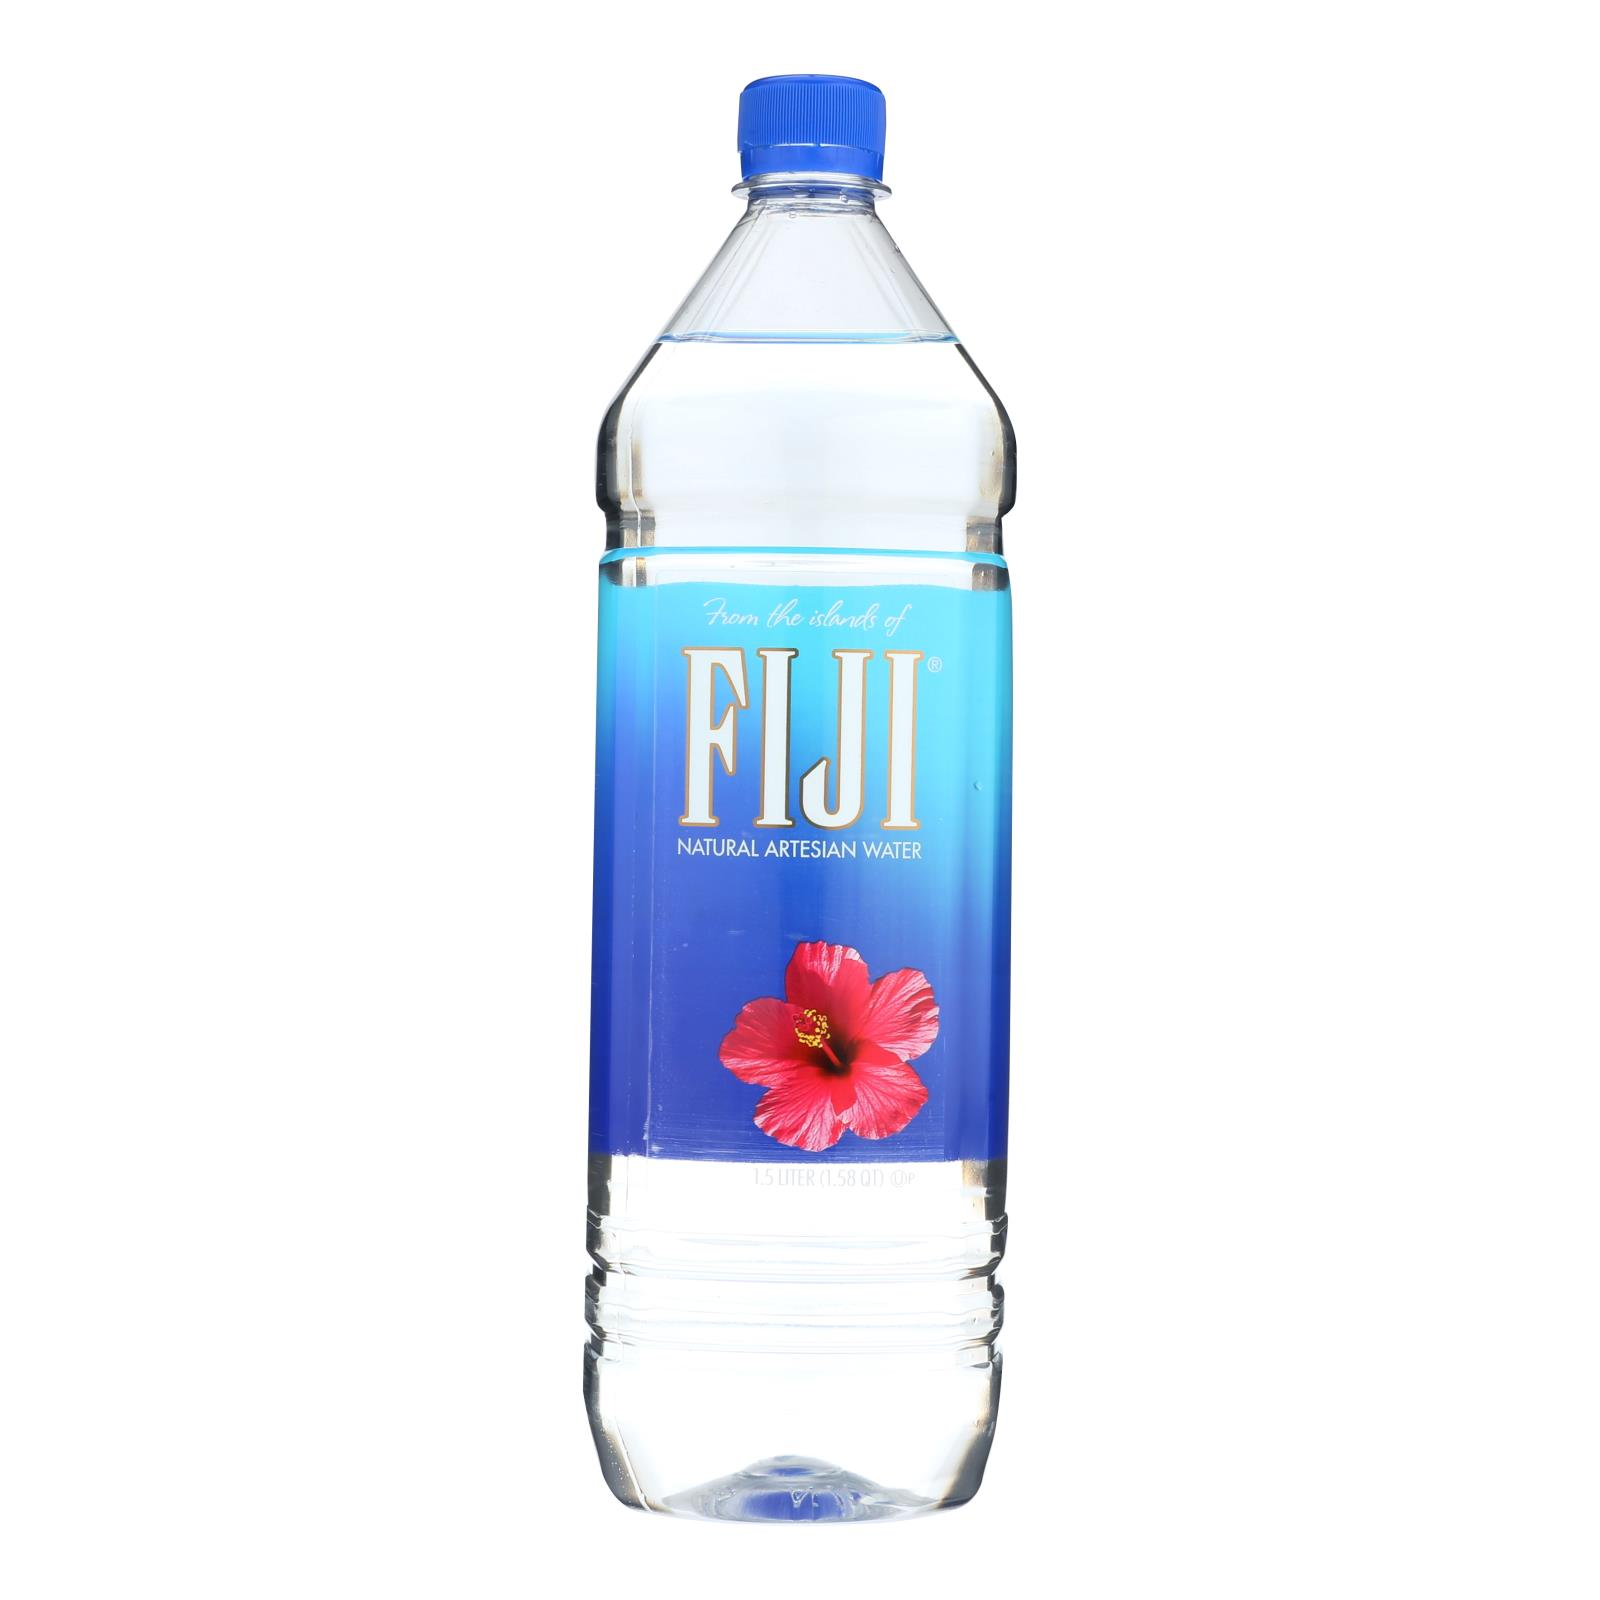 Fiji Natural Artesian Water Artesian Water - Case of 12 - 50.7 oz.